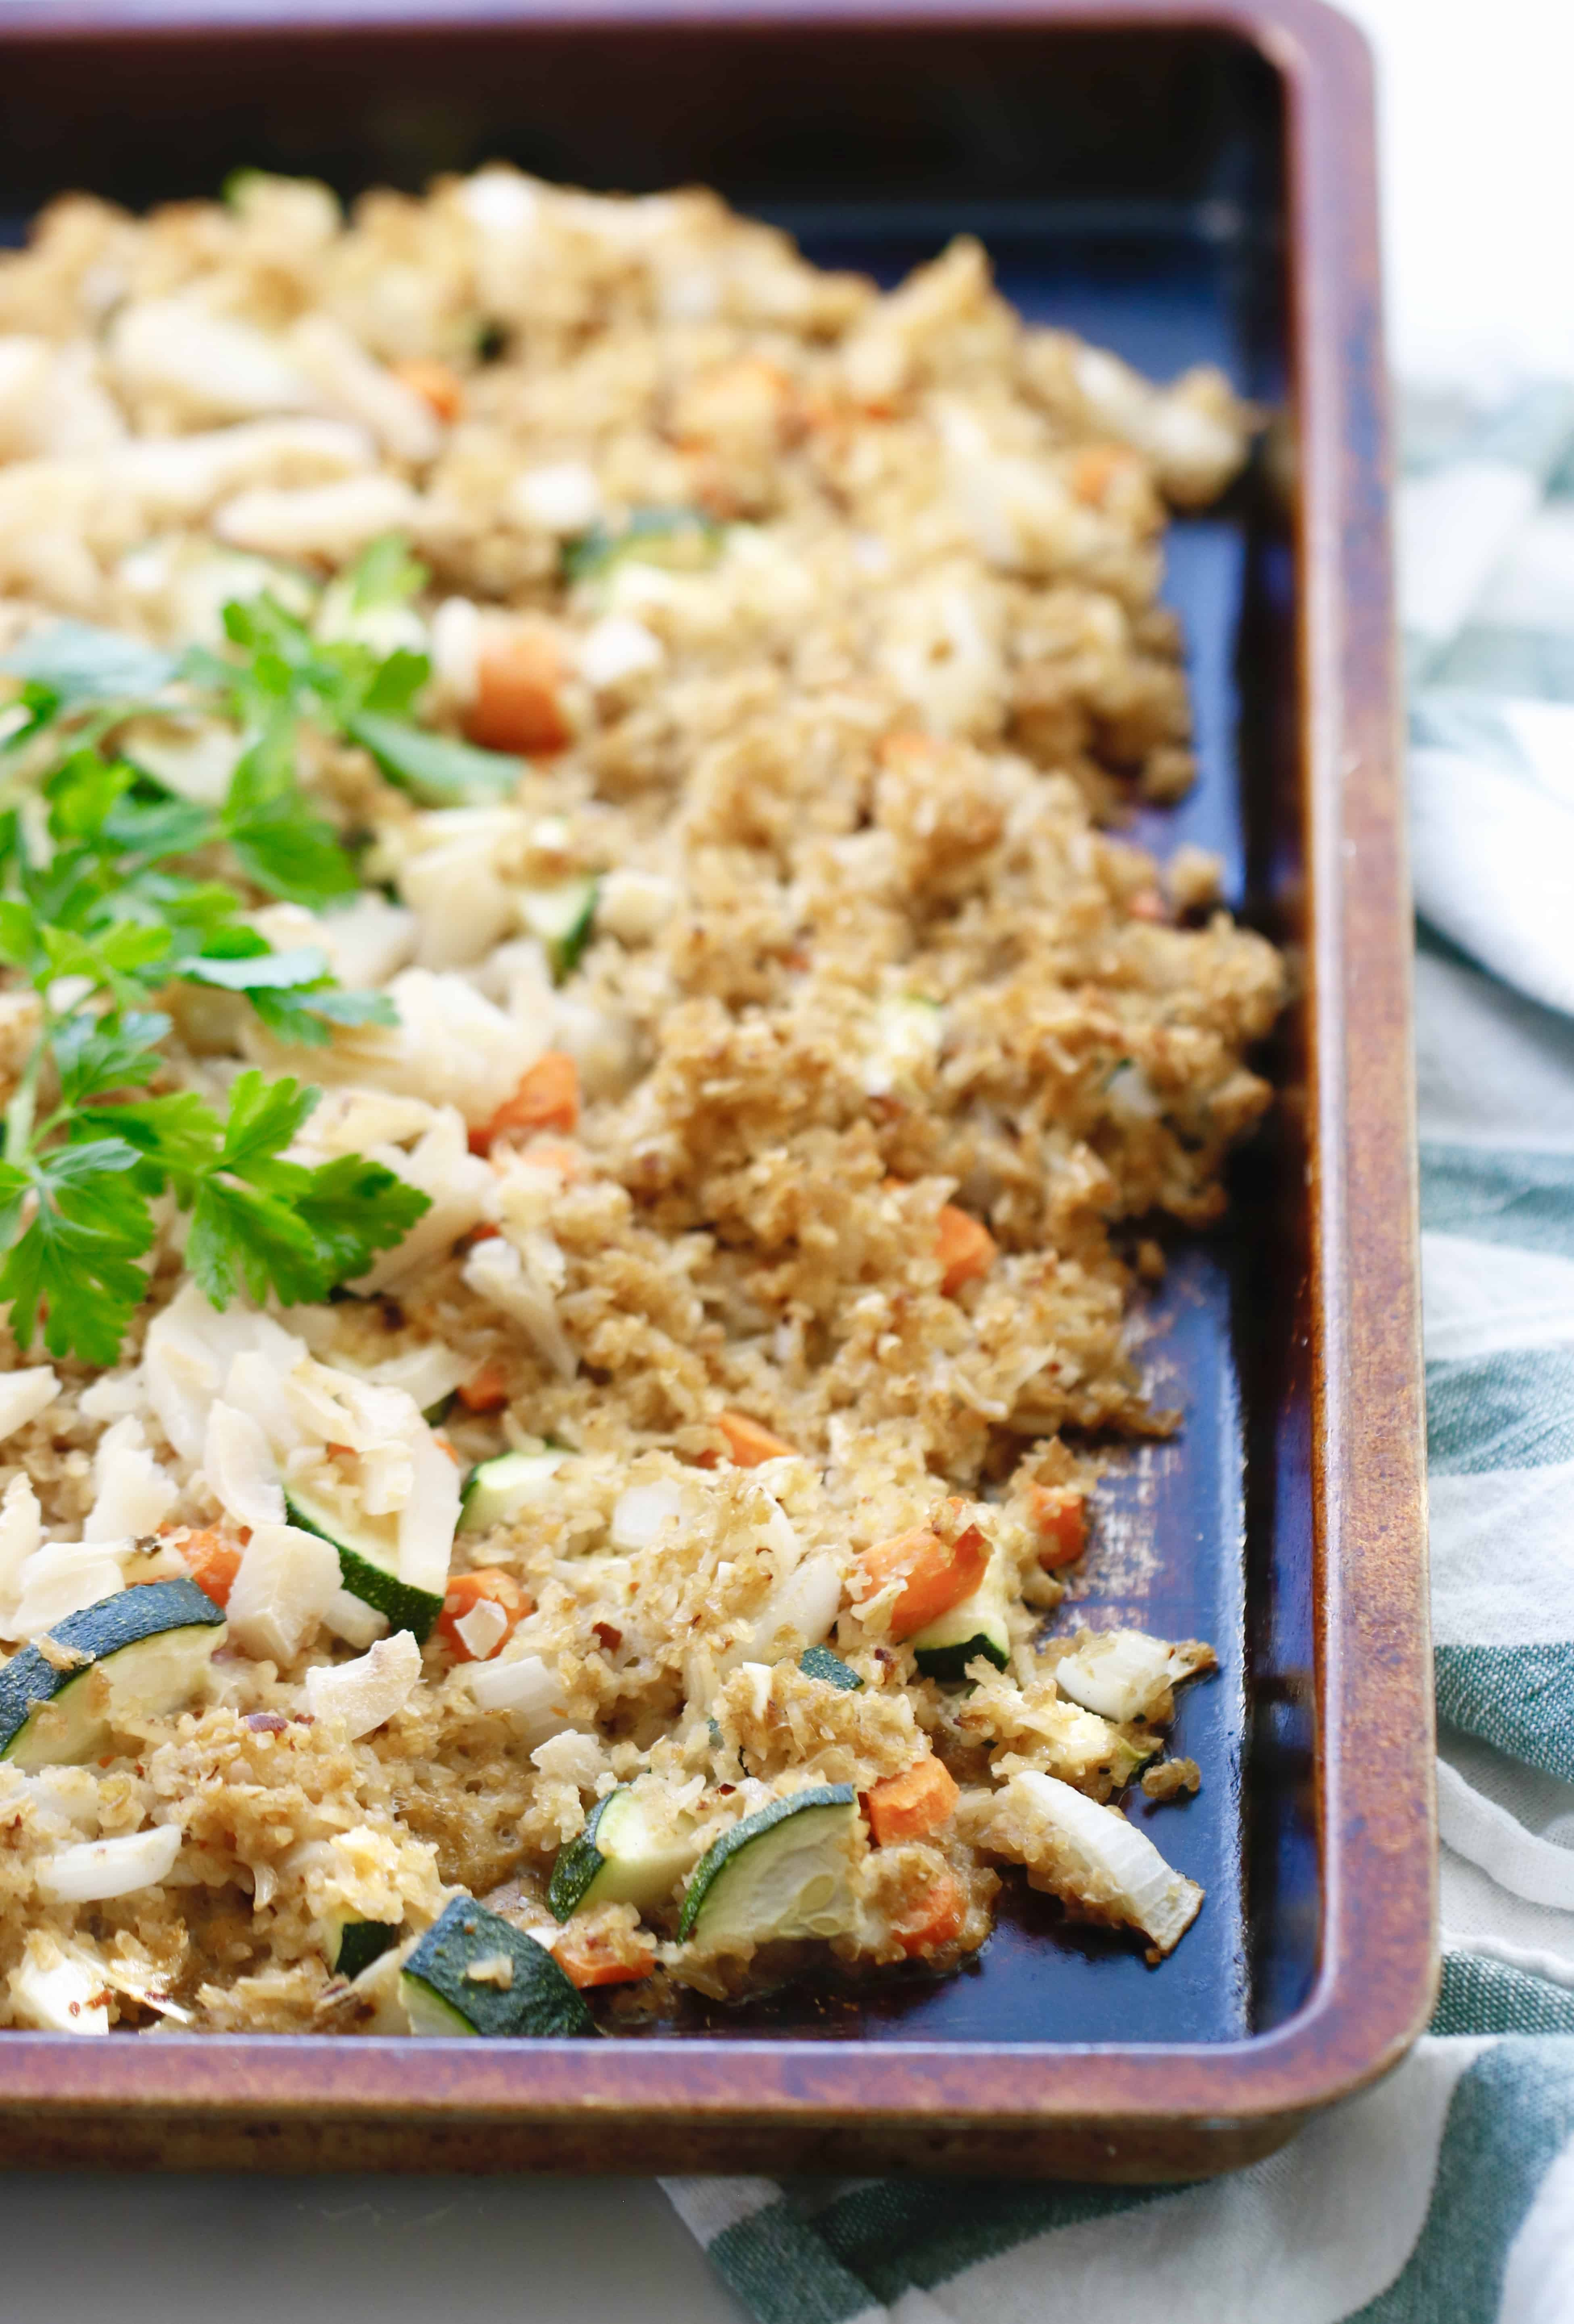 Baked Fried Rice with Veggies - Gluten Free + Vegetarian